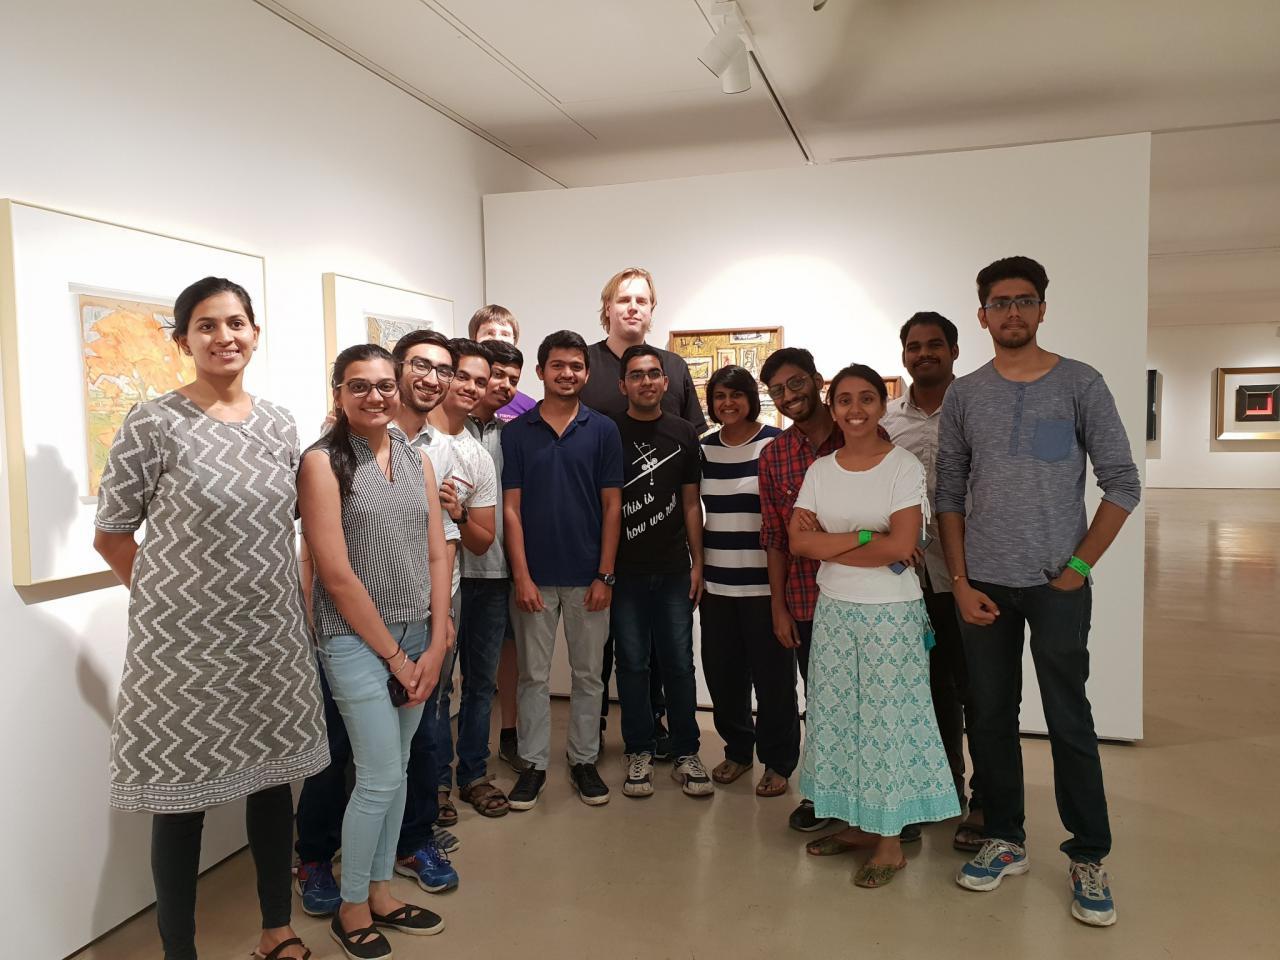 Participants of the Coding Culture Hackathon II